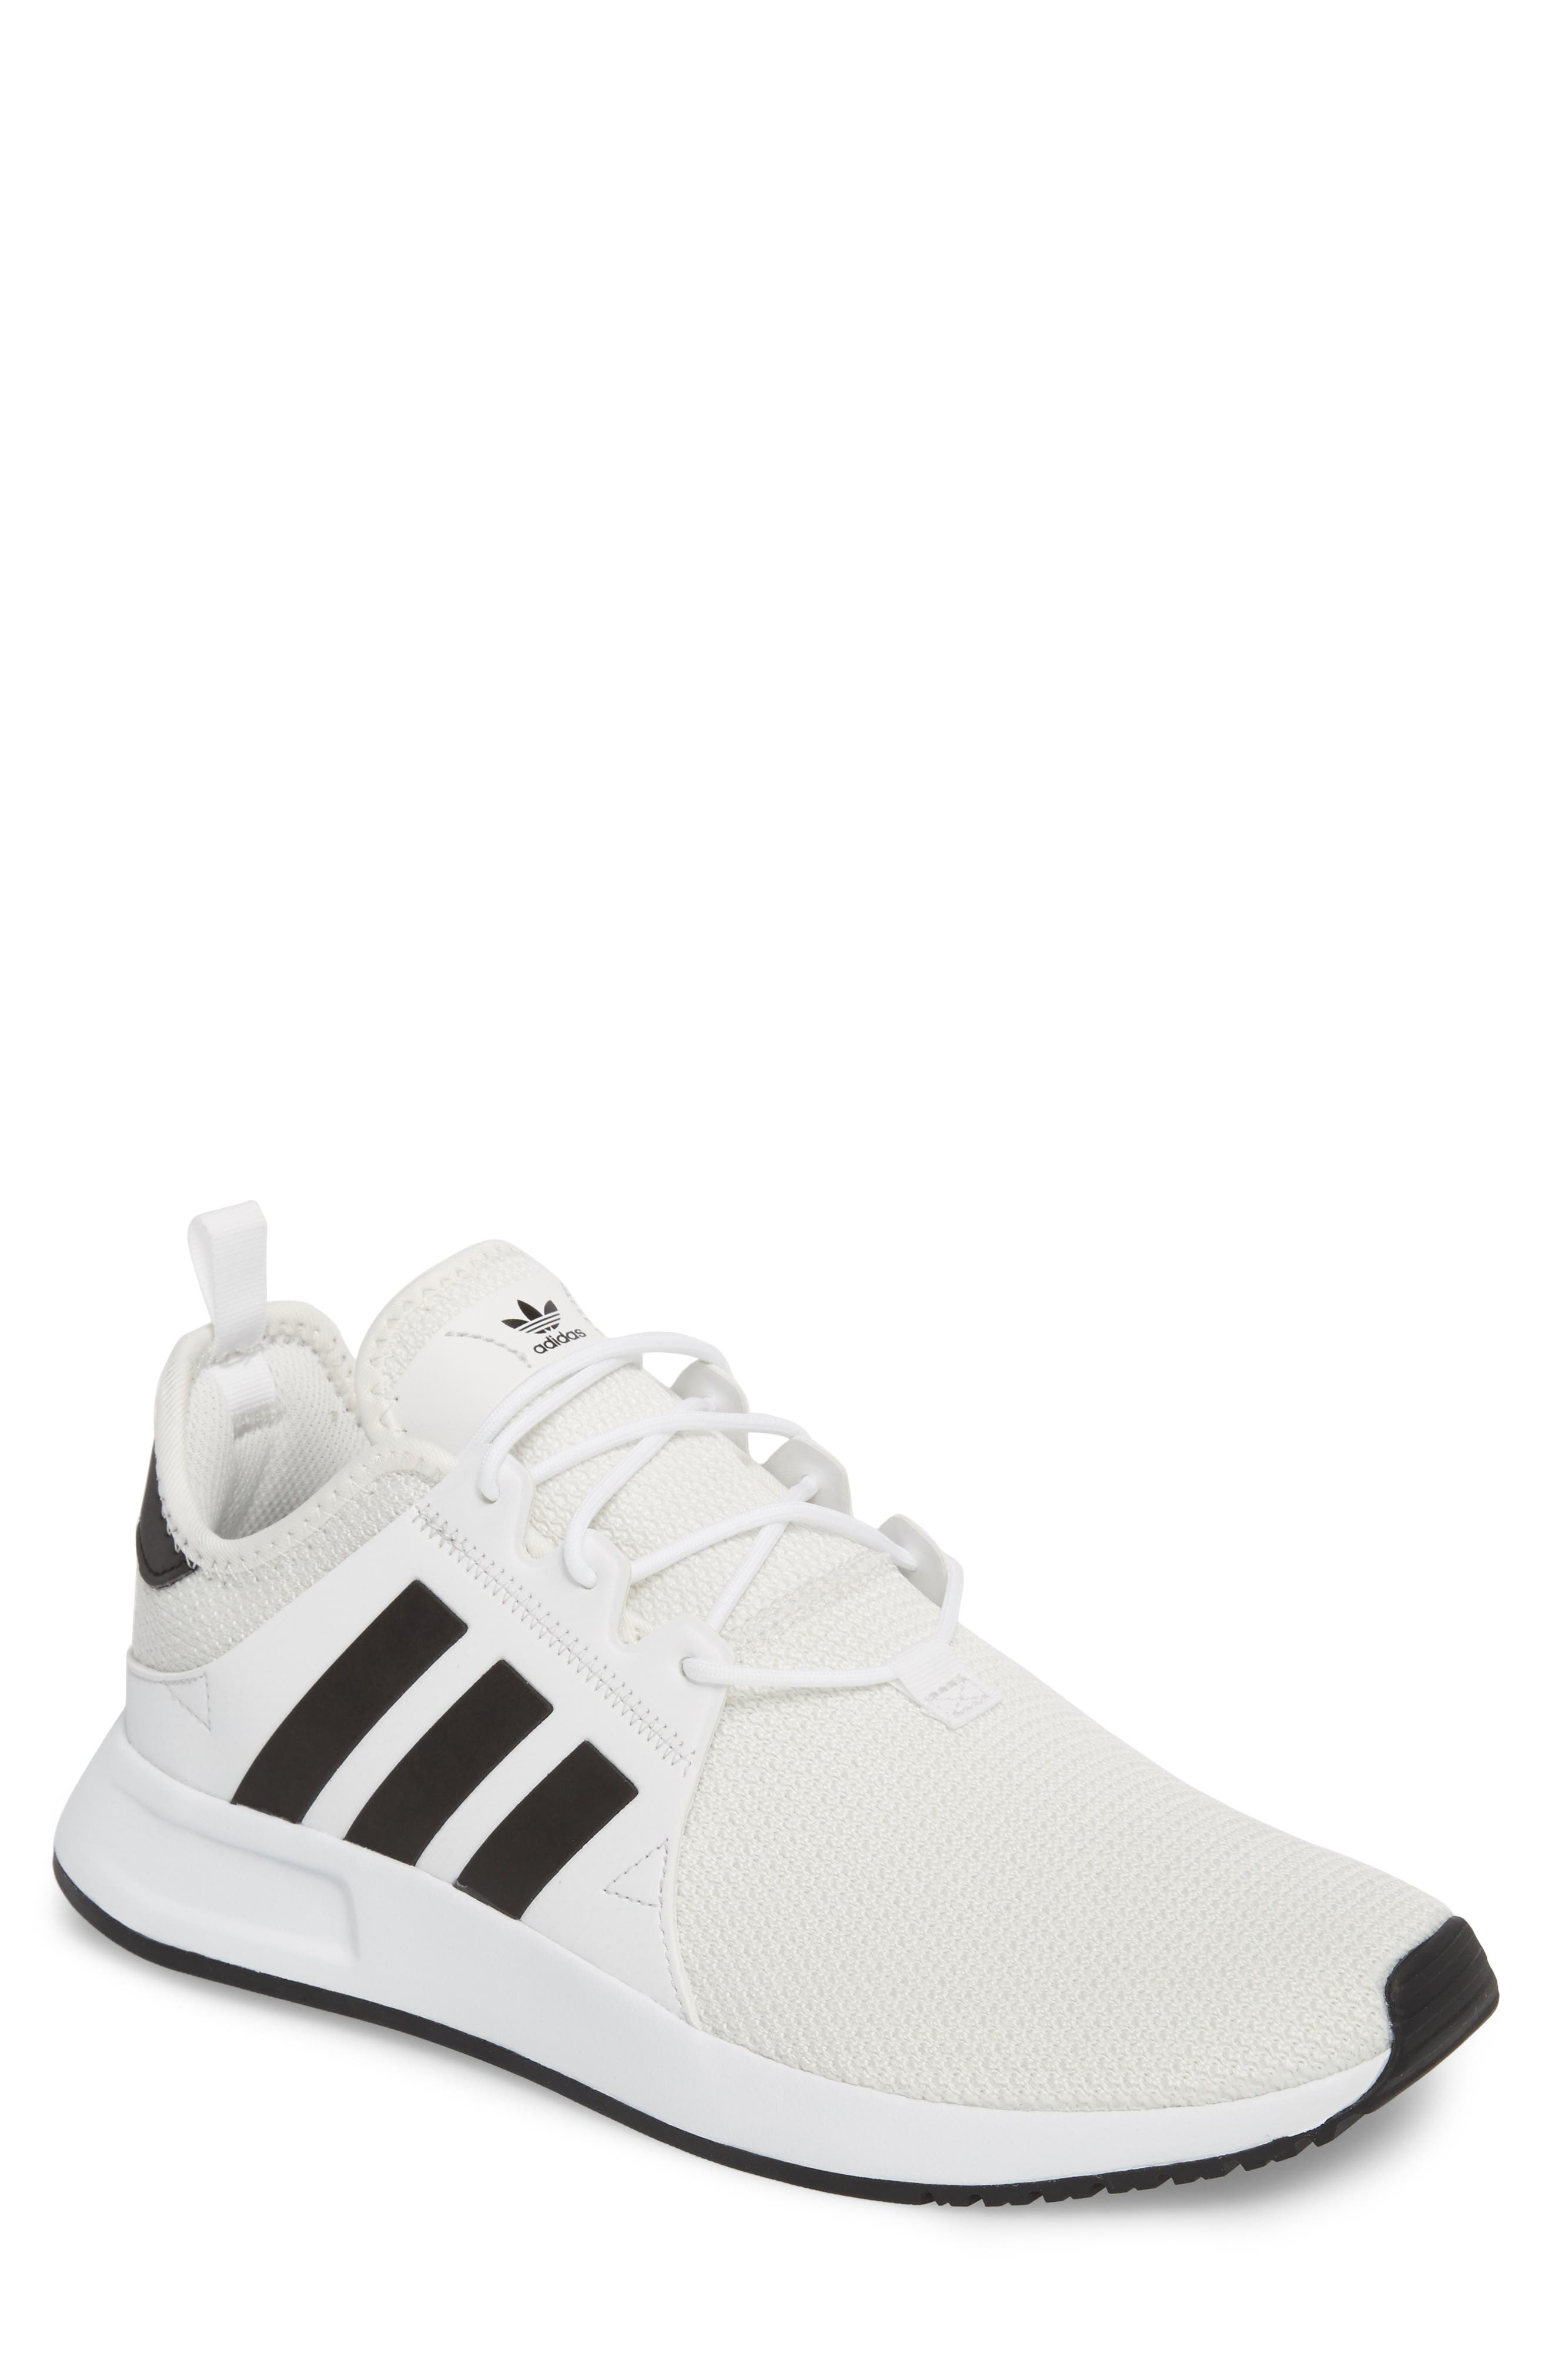 Main Image - adidas X_PLR Sneaker (Men)